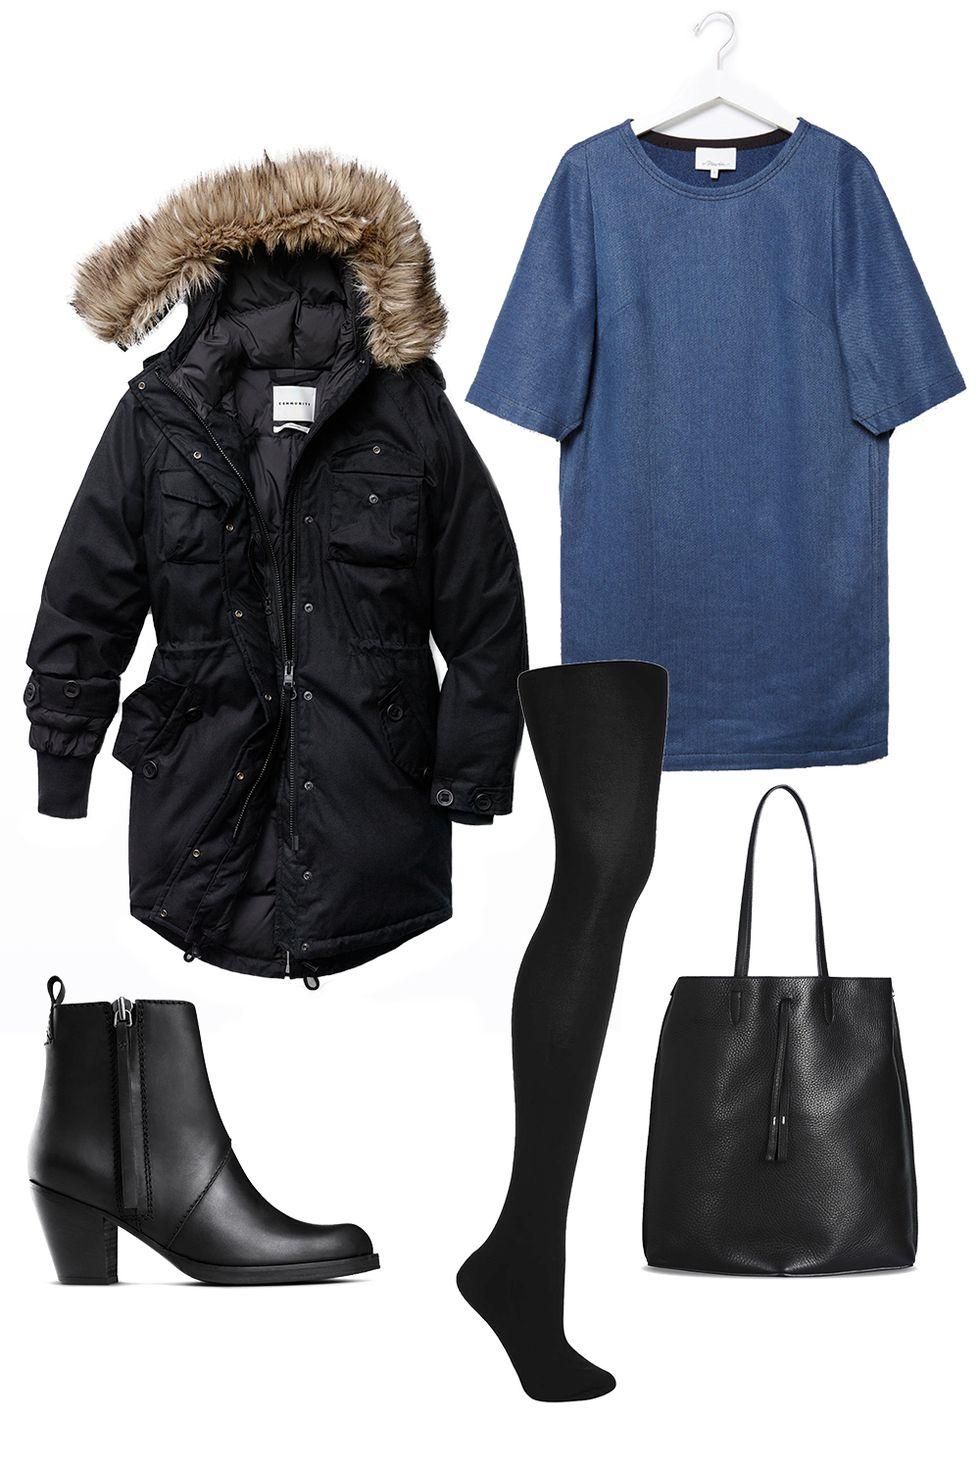 how-to-style-blue-med-dress-tshirt-black-jacket-coat-parka-black-tights-black-bag-tote-black-shoe-booties-fall-winter-fashion-work.jpg